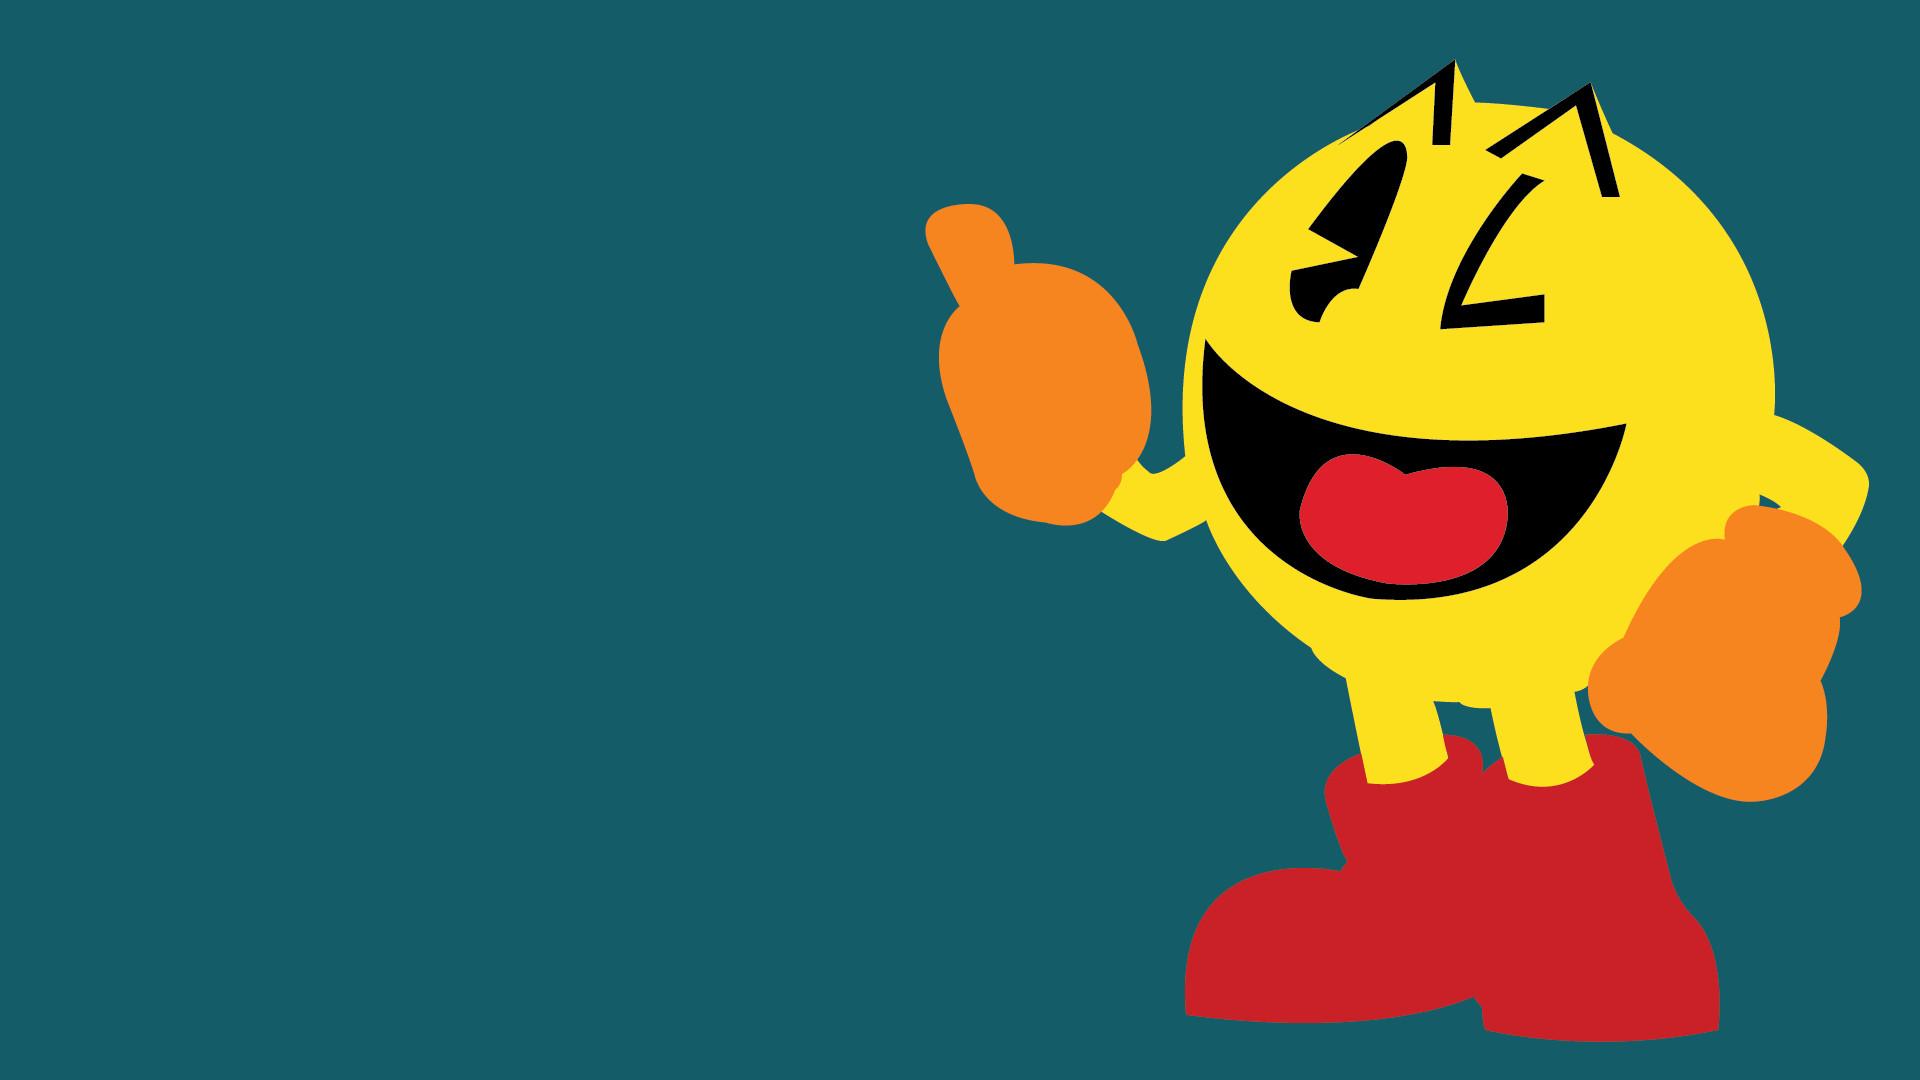 Pacman Wallpaper